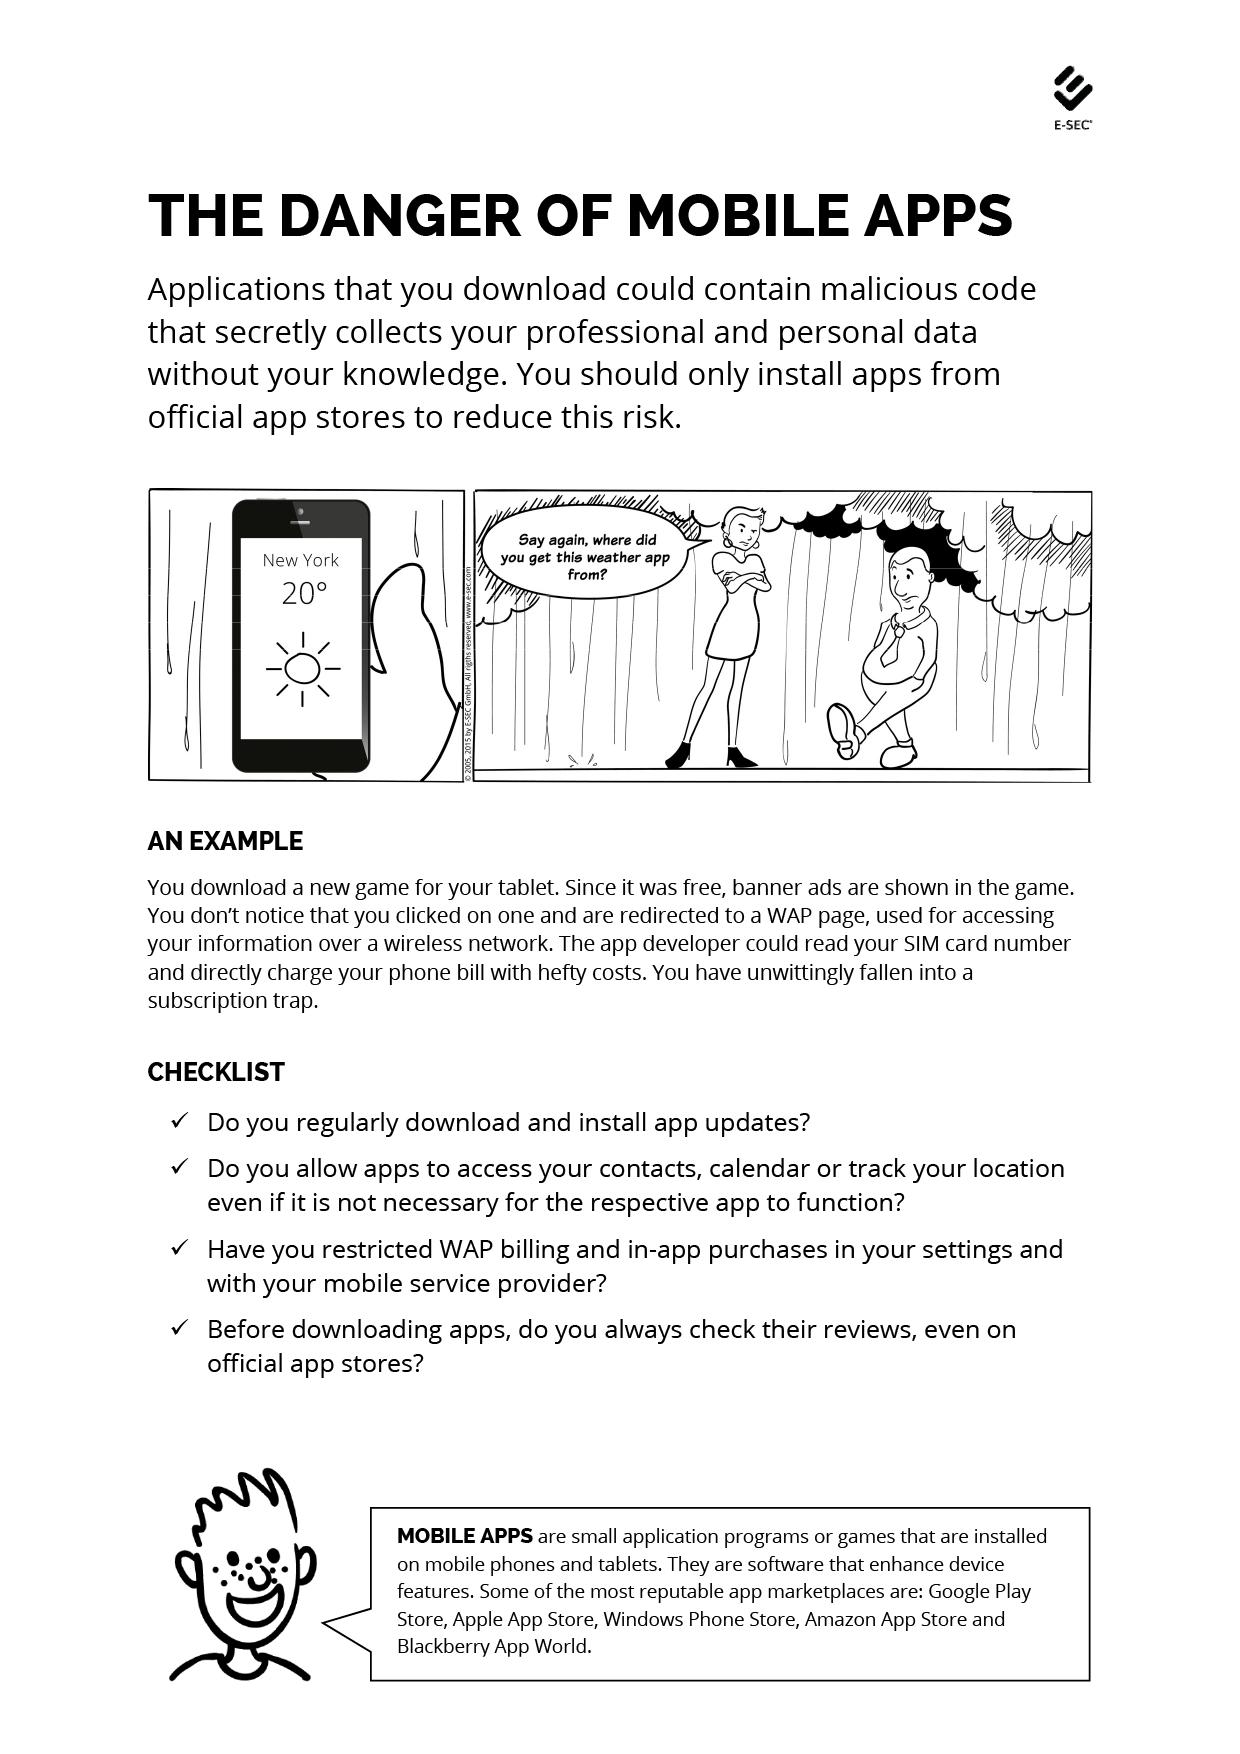 The Danger of Mobile Apps